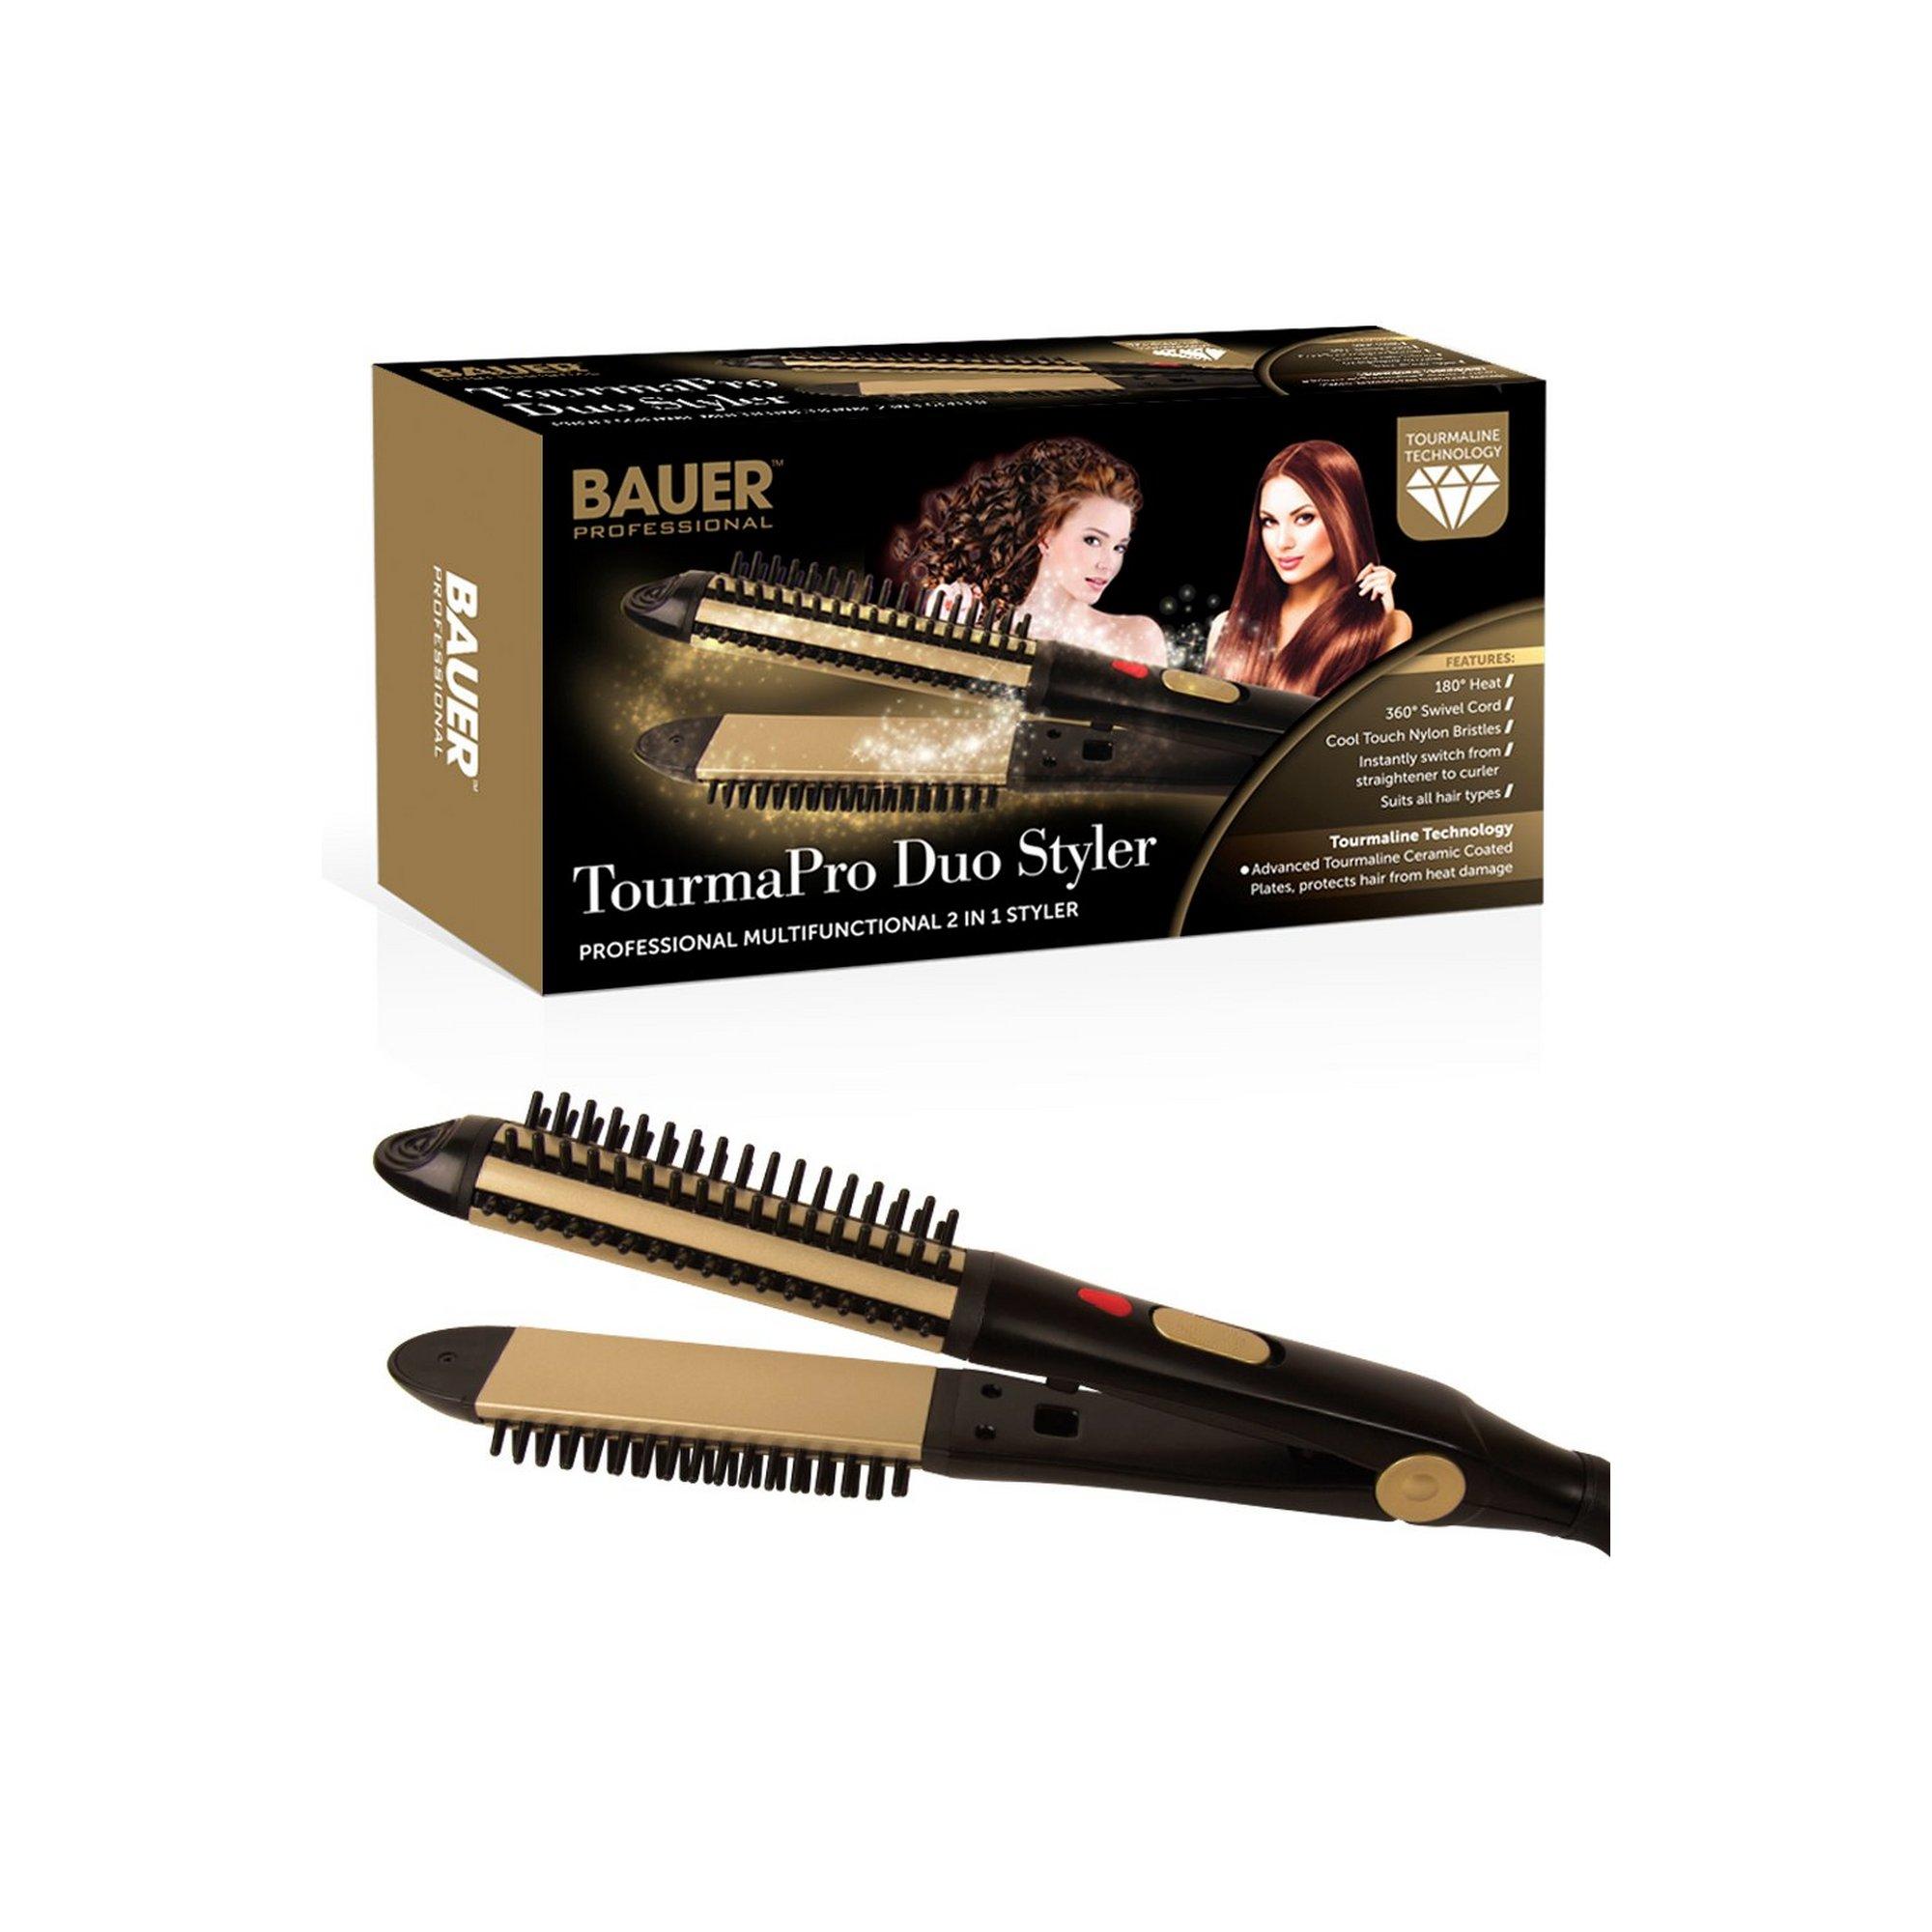 Image of Bauer Tourma Pro Duo Hair Styler